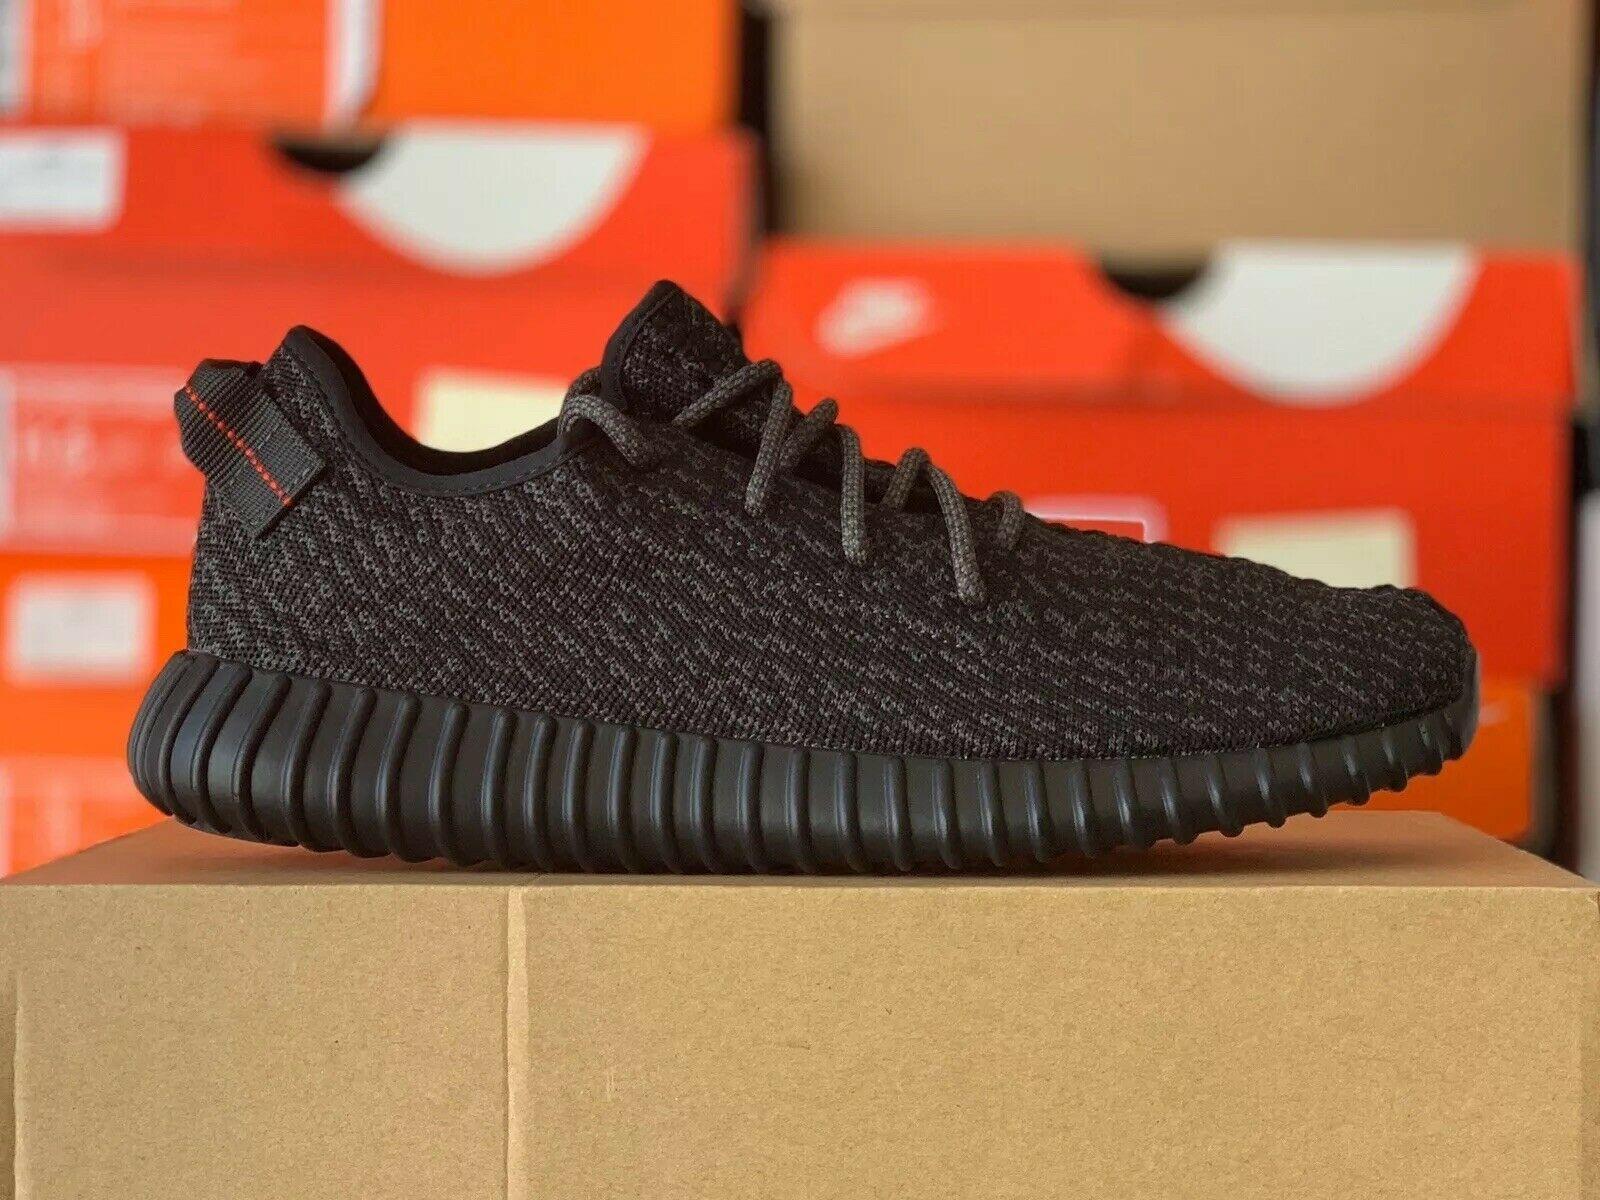 adidas Yeezy Boost 350 Pirate Black 2016